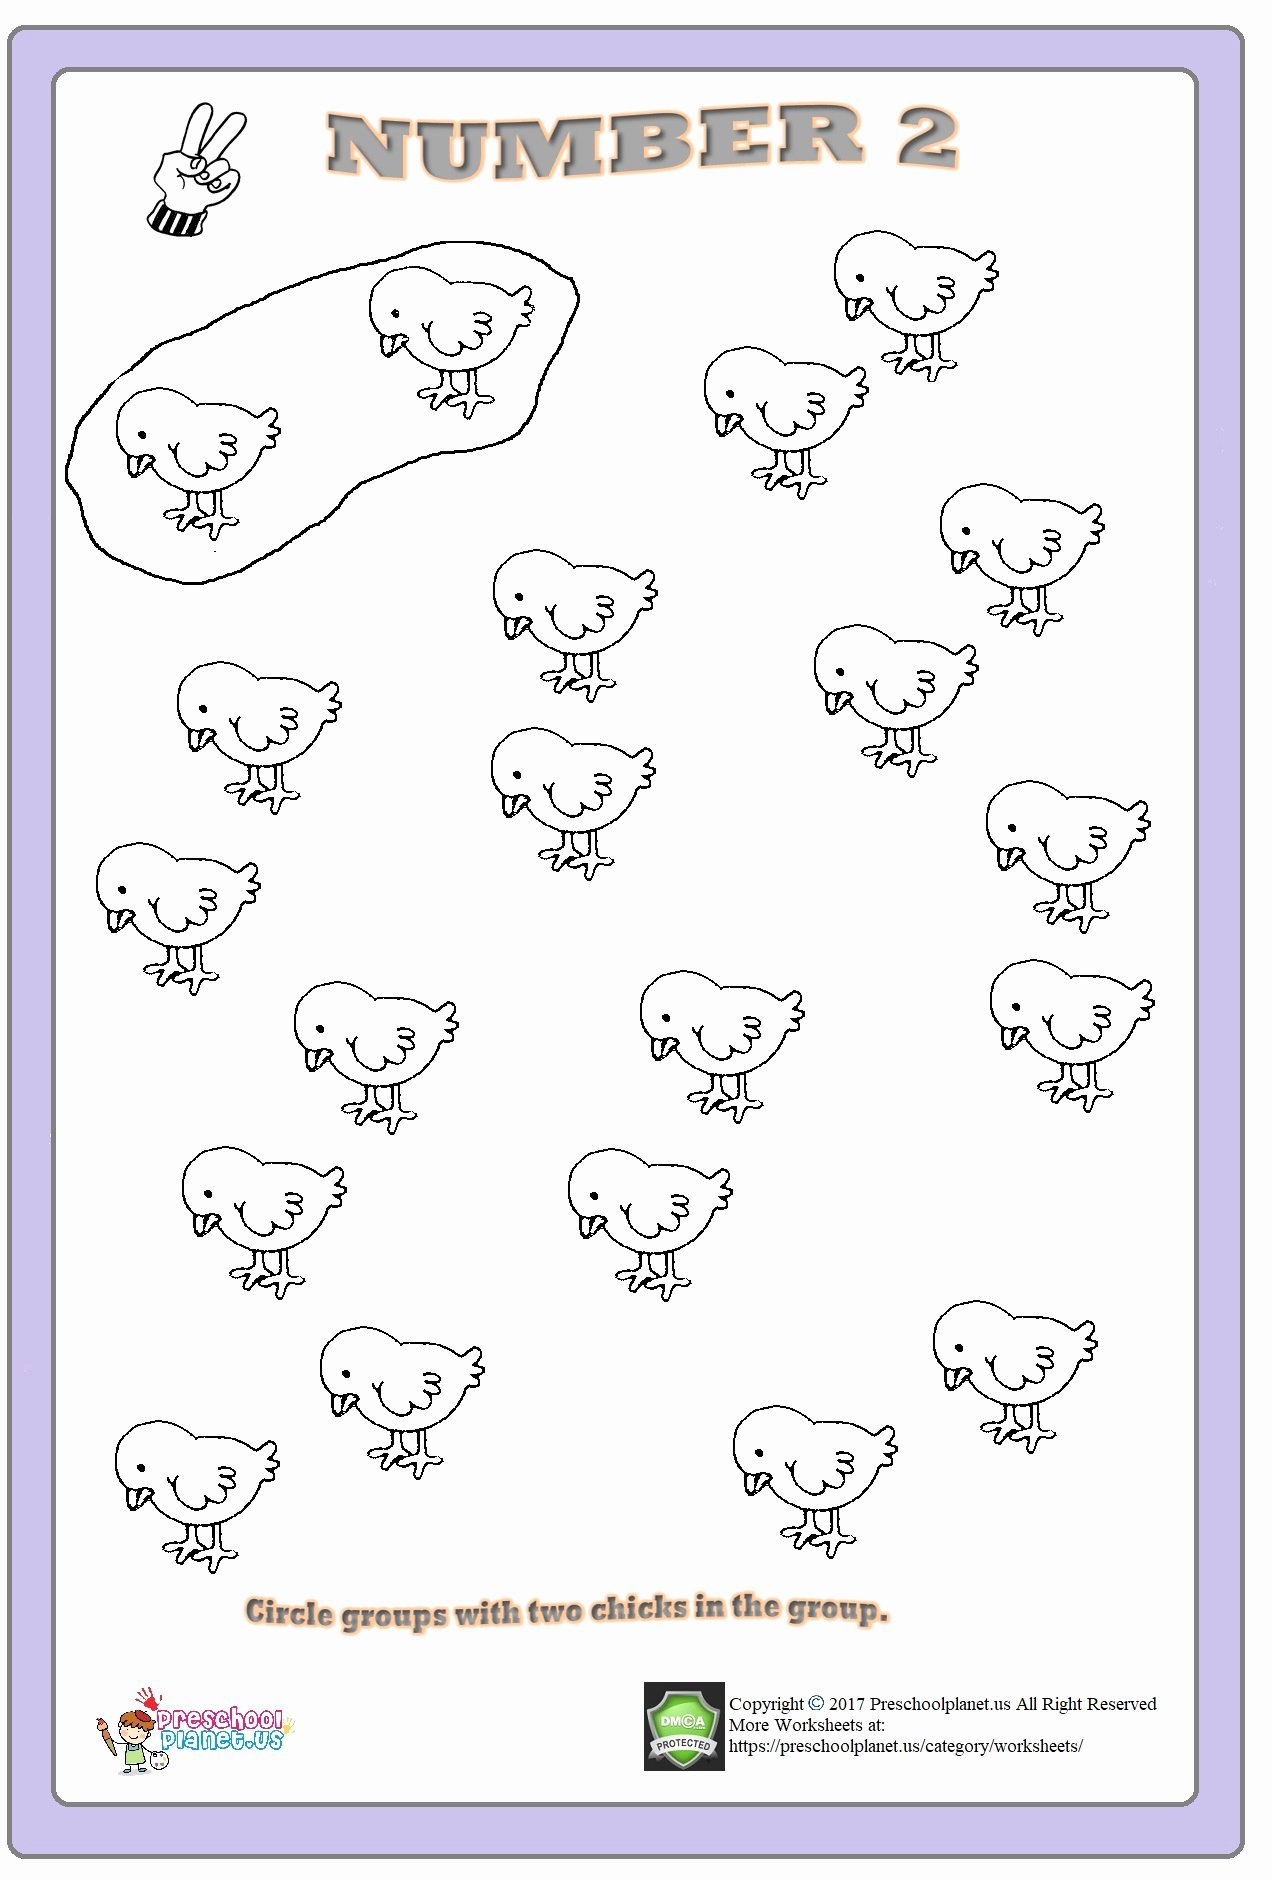 Number 2 Worksheets for Preschoolers top Number 2 Worksheets for Kindergarten – Preschoolplanet